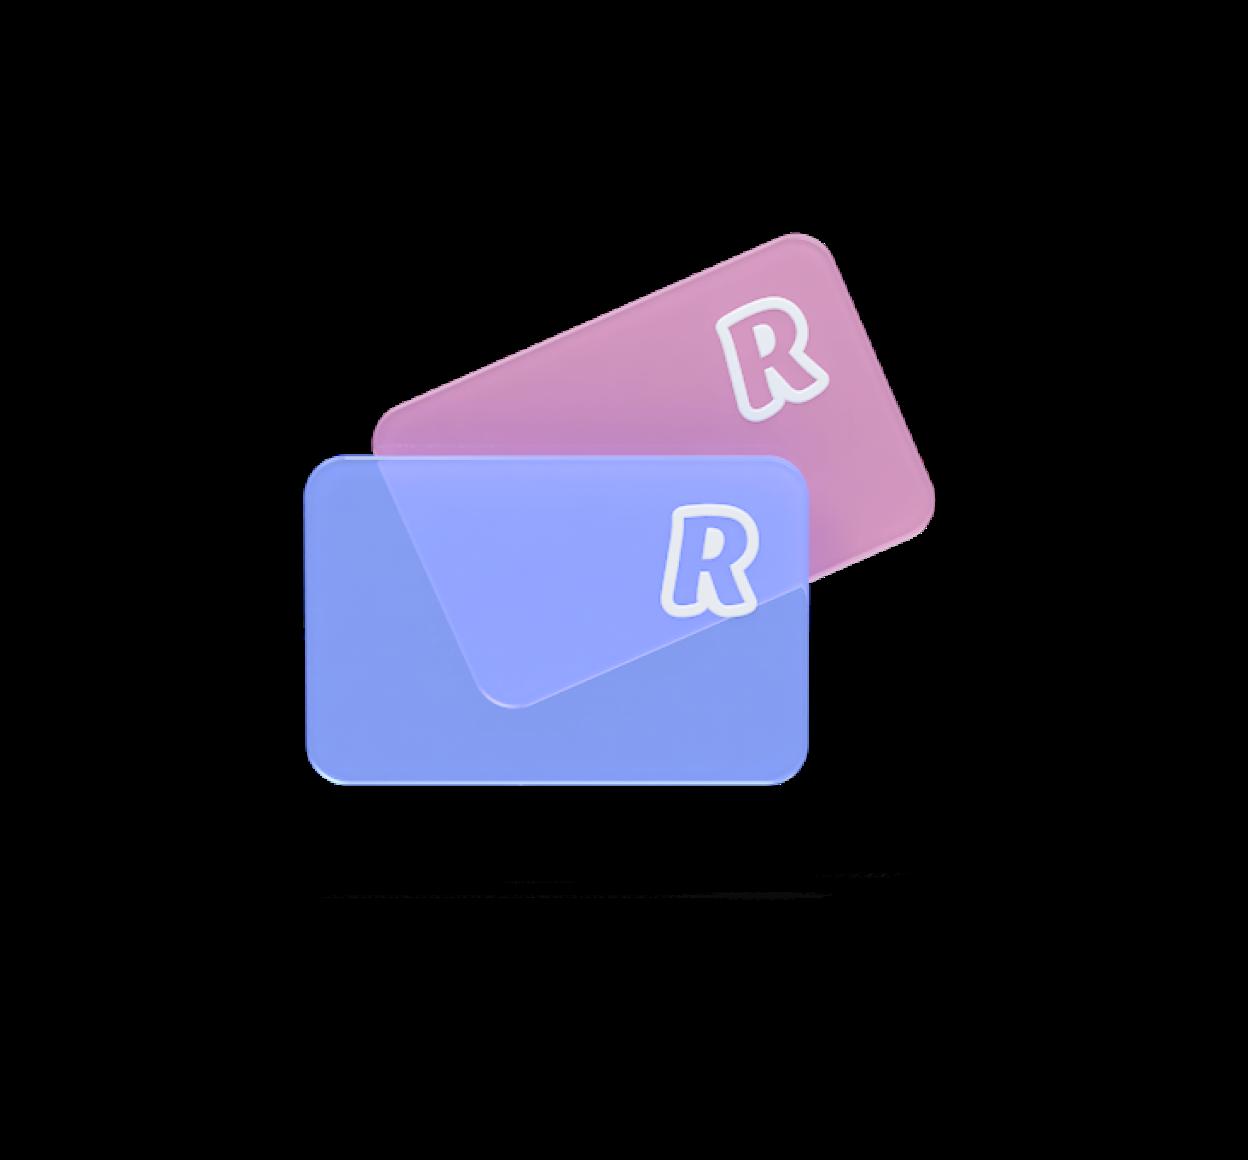 Virtuelle Einwegkarten